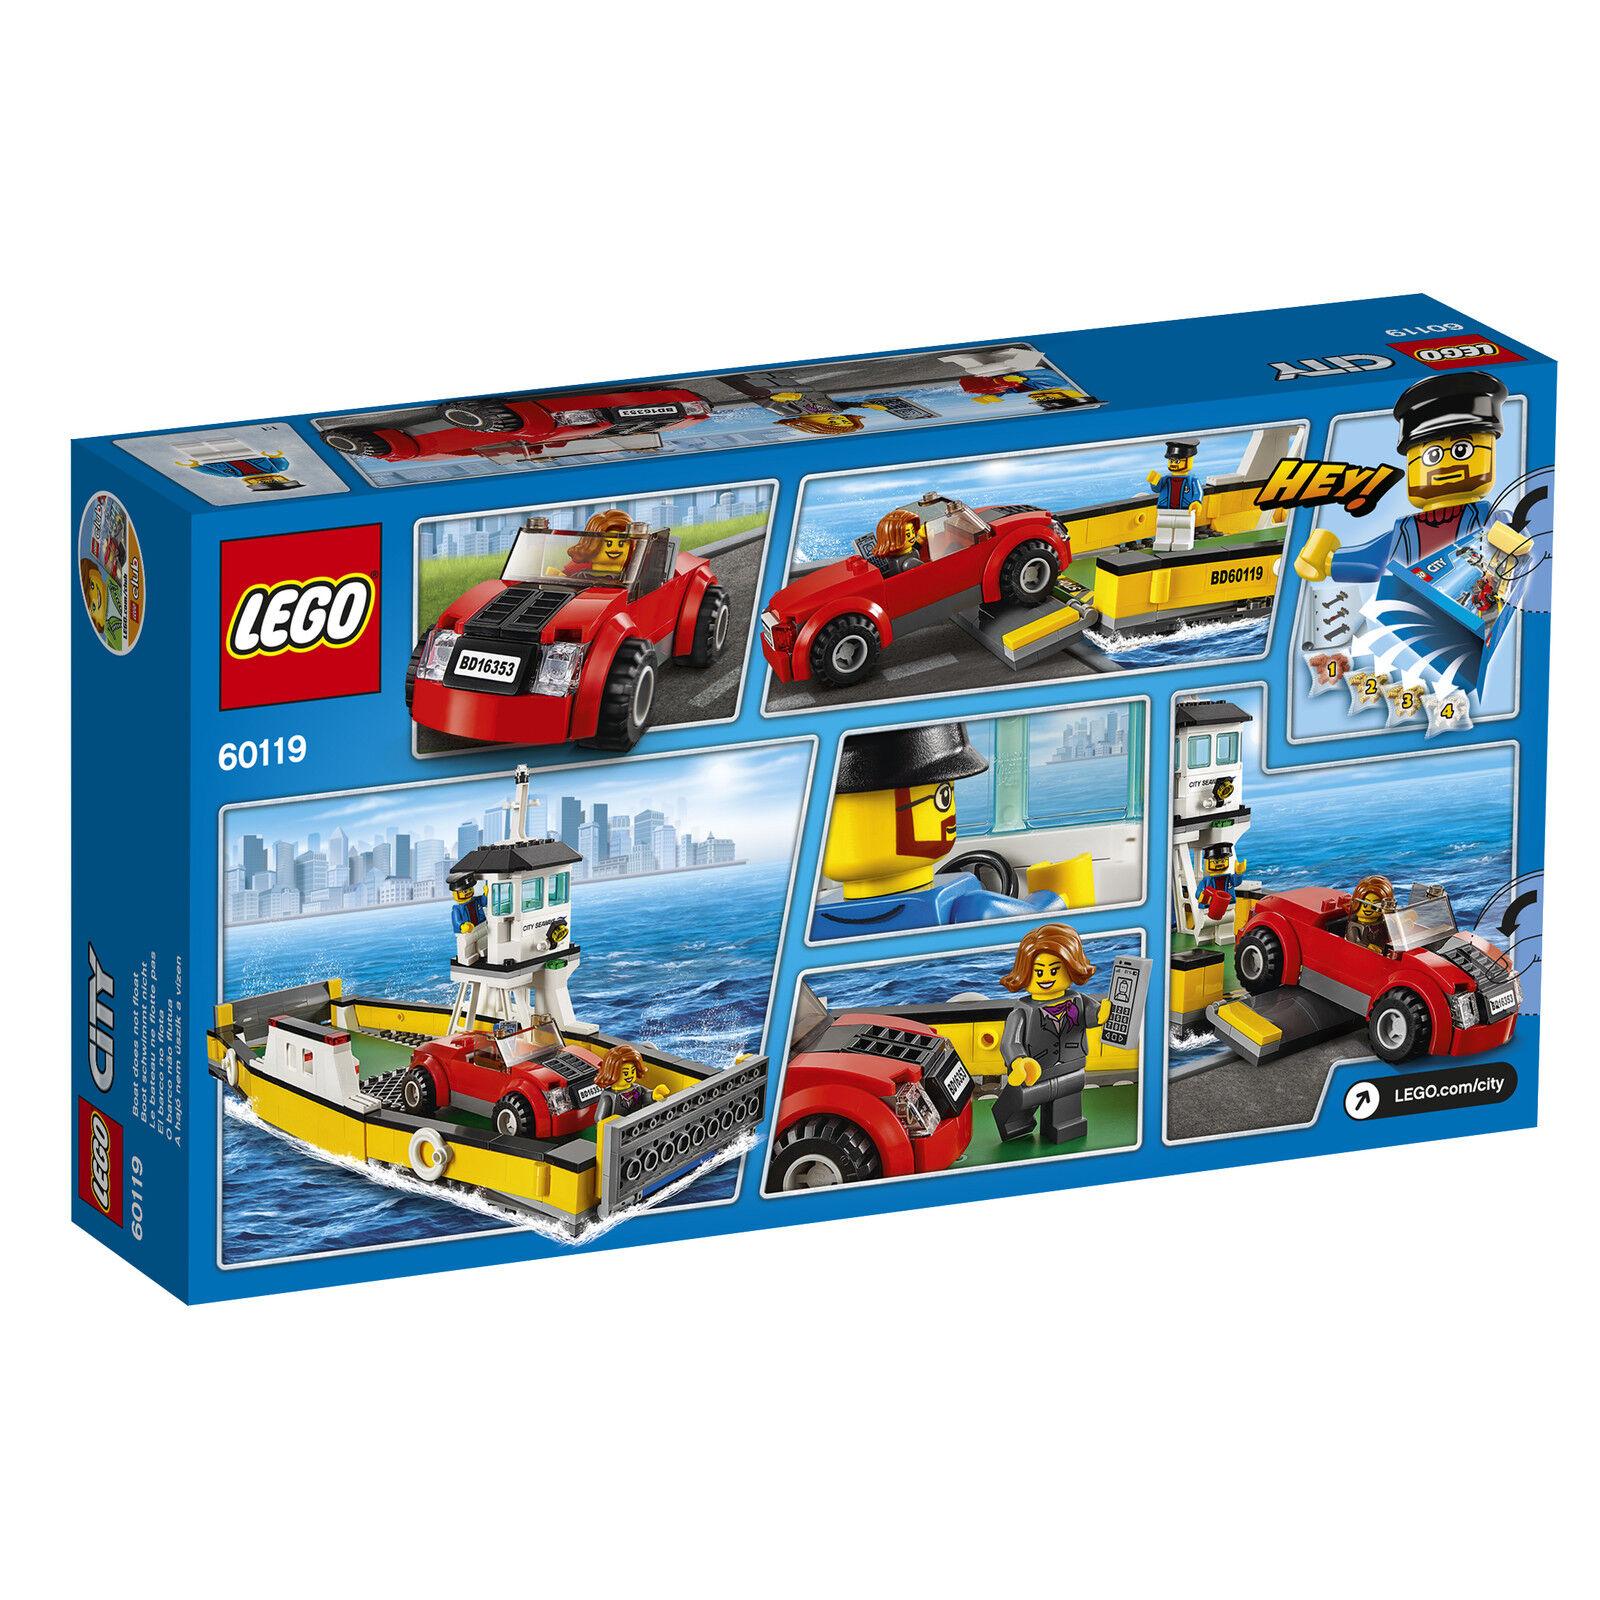 LEGO® City 60119 Fähre Ferry NEU OVP_ Ferry Fähre NEW MISB NRFB 3432e6